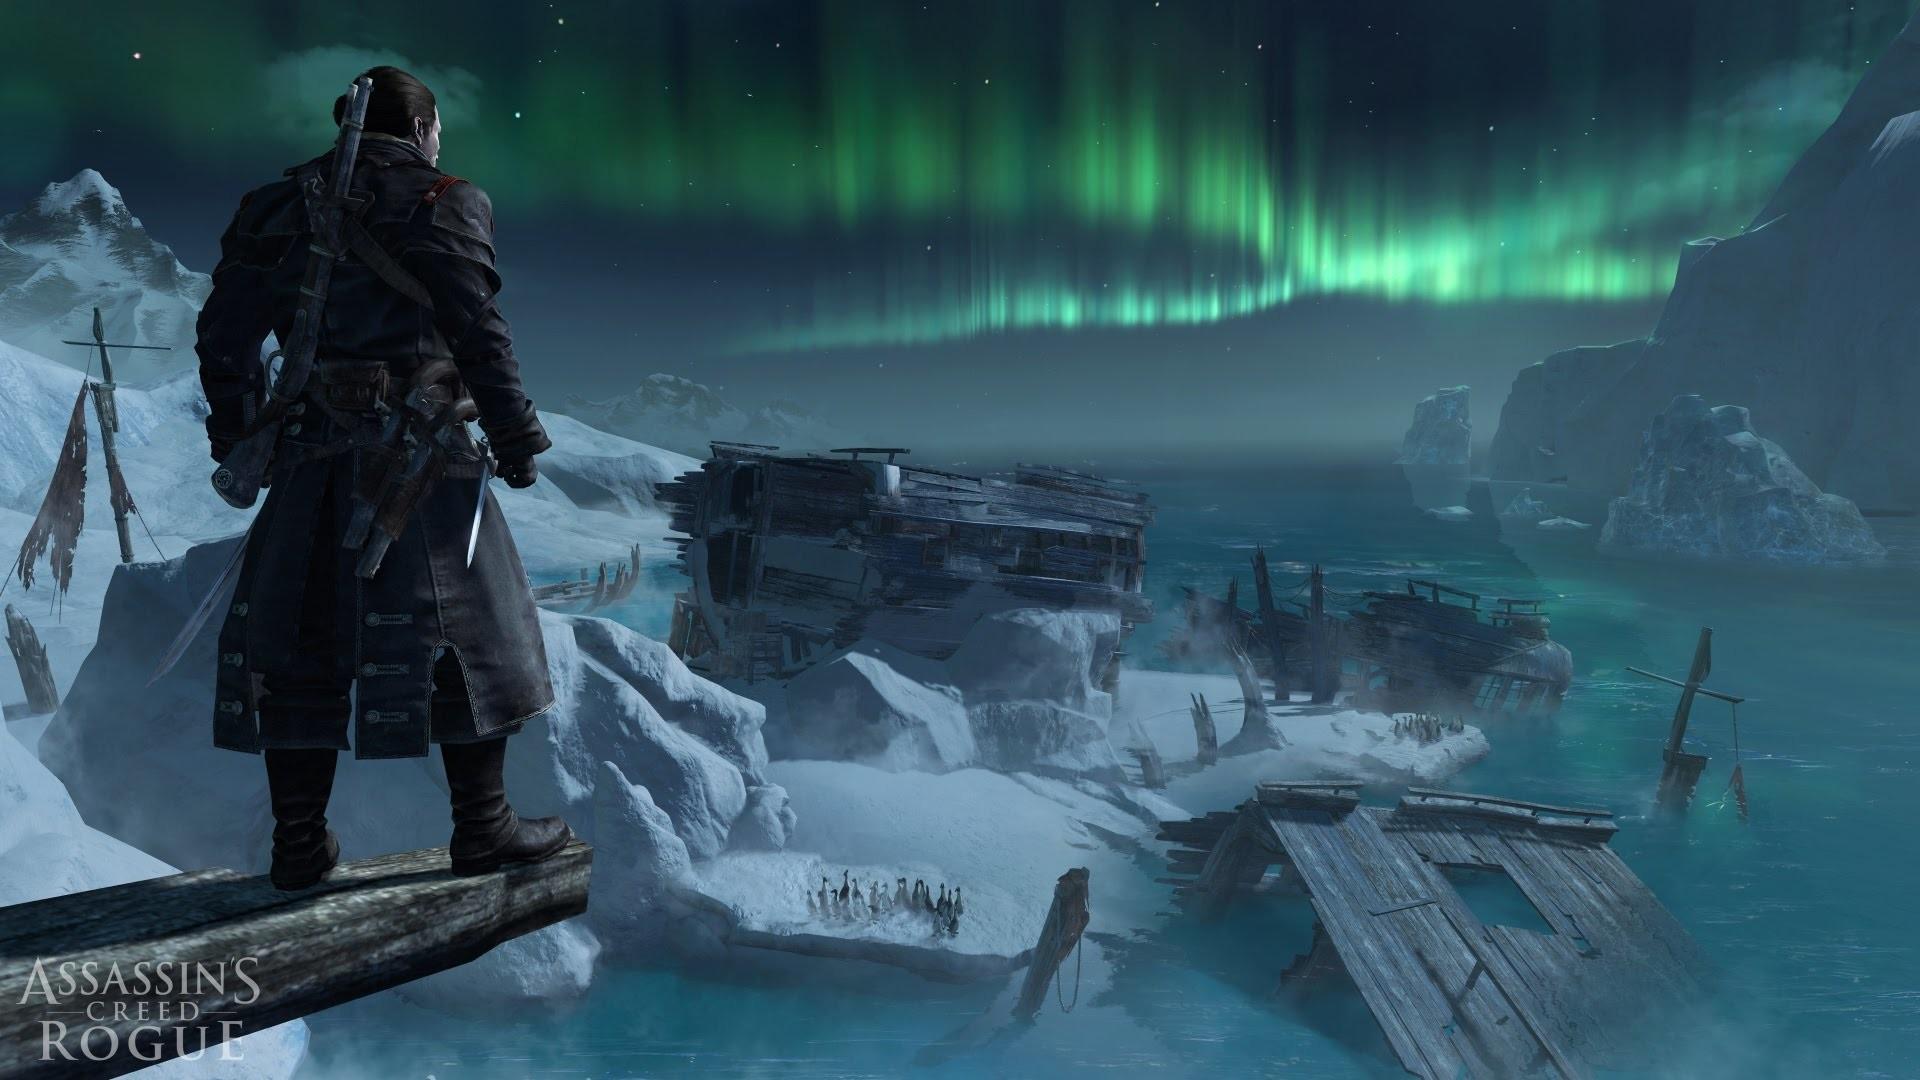 Assassin's Creed Rogue PC Walkthrough/Gameplay Part 1 [1080p HD]